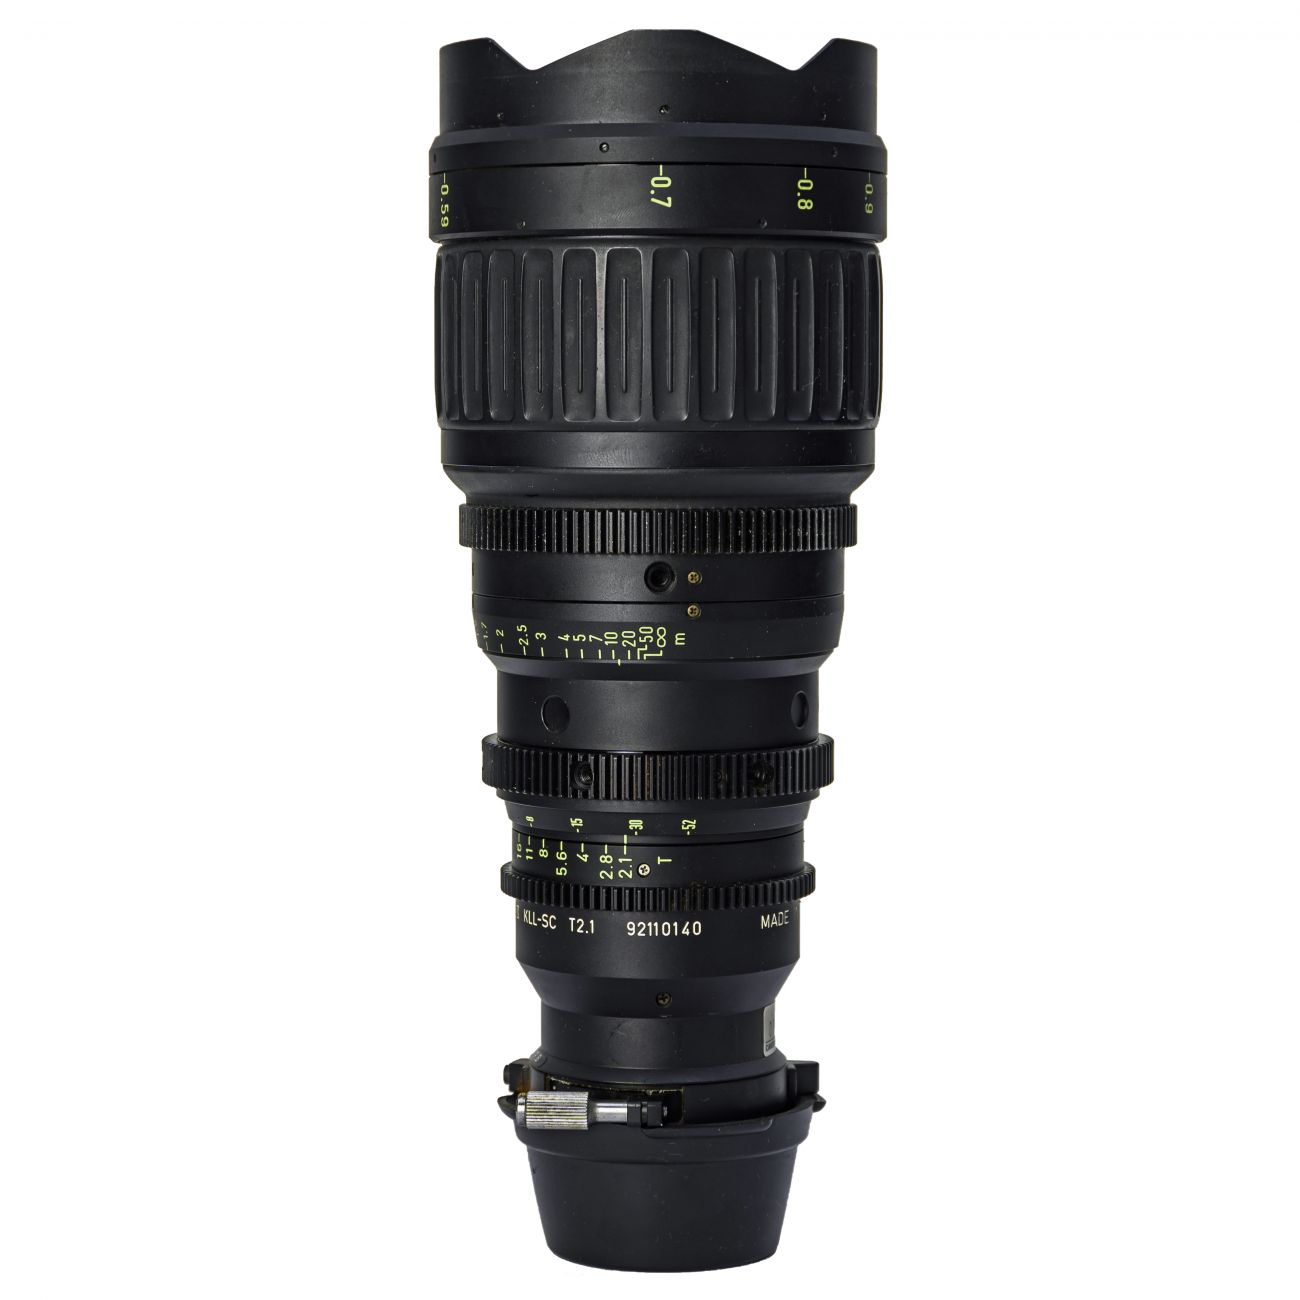 4.7-52mm HD Canon HJ11x4.7B-III T2.1 CINE ZOOM